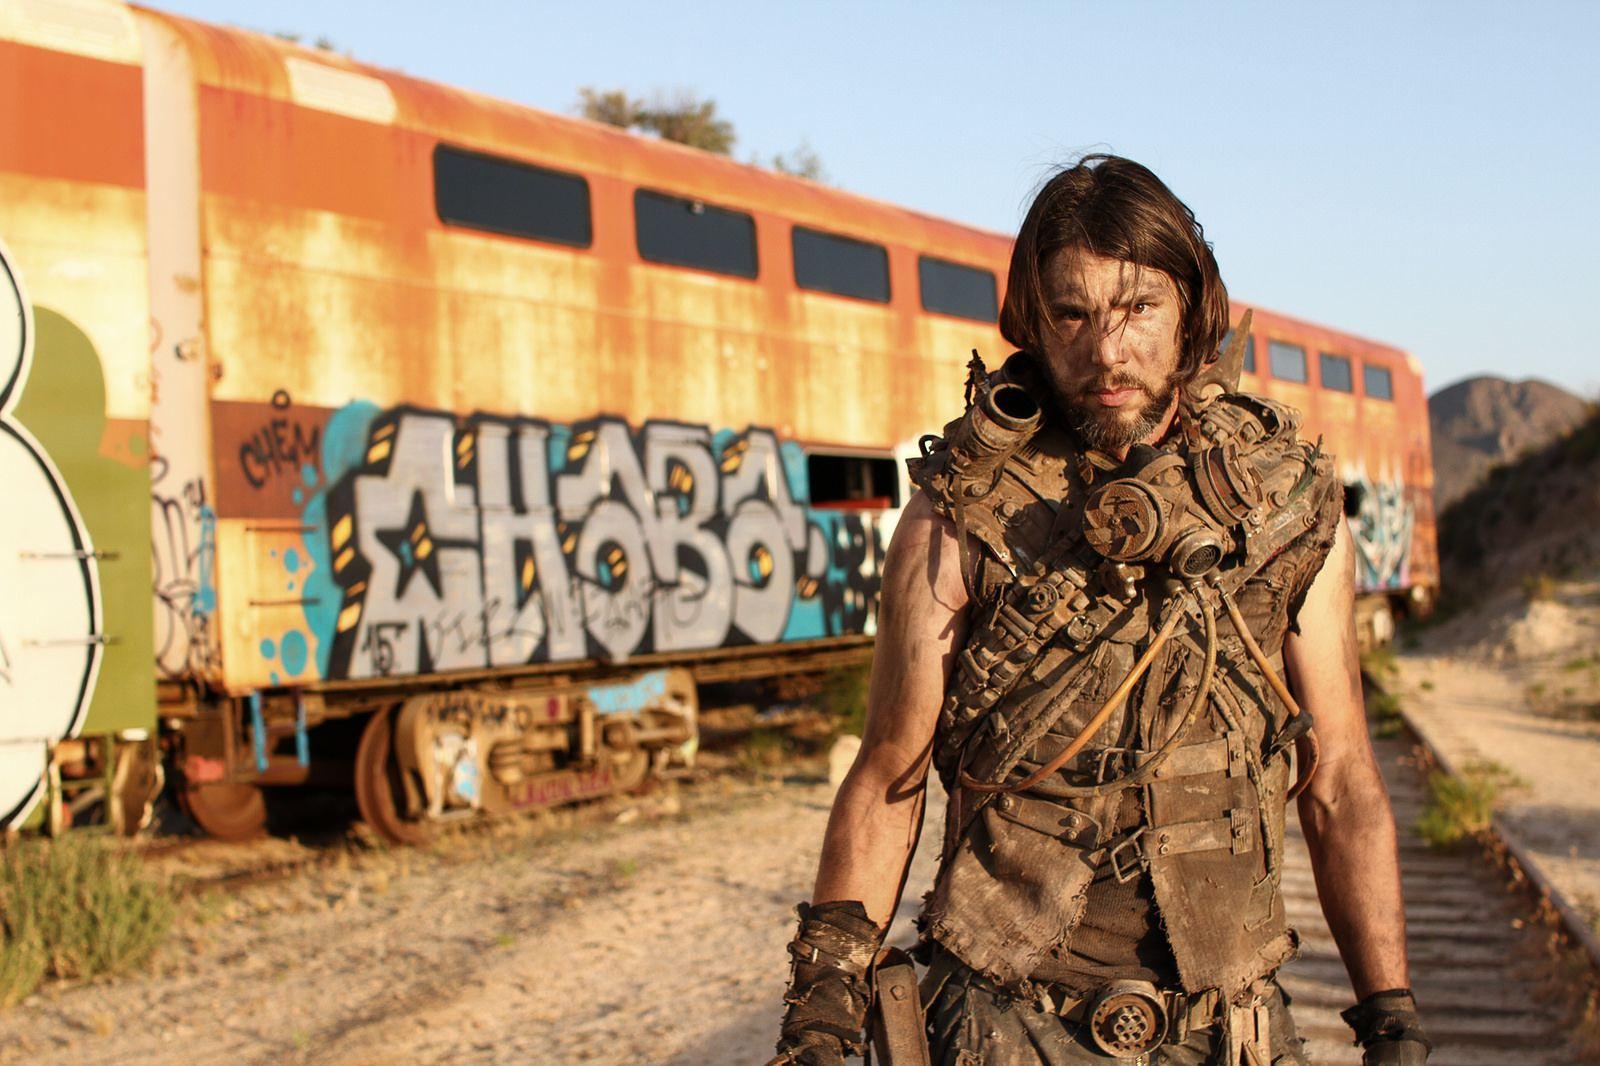 Post apocalyptic jacket vest top armor. Homemade. Gas mask respirator. Abandoned trains.